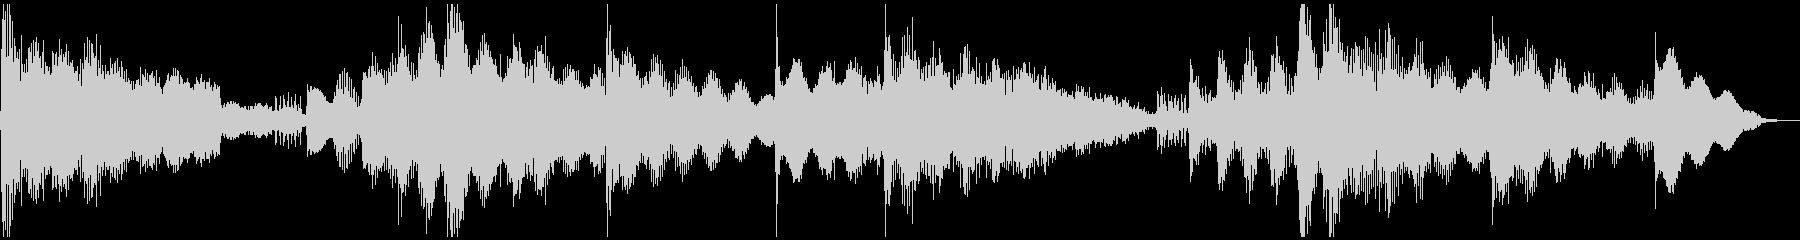 【CM】クールなエレクトロBGM・11の未再生の波形